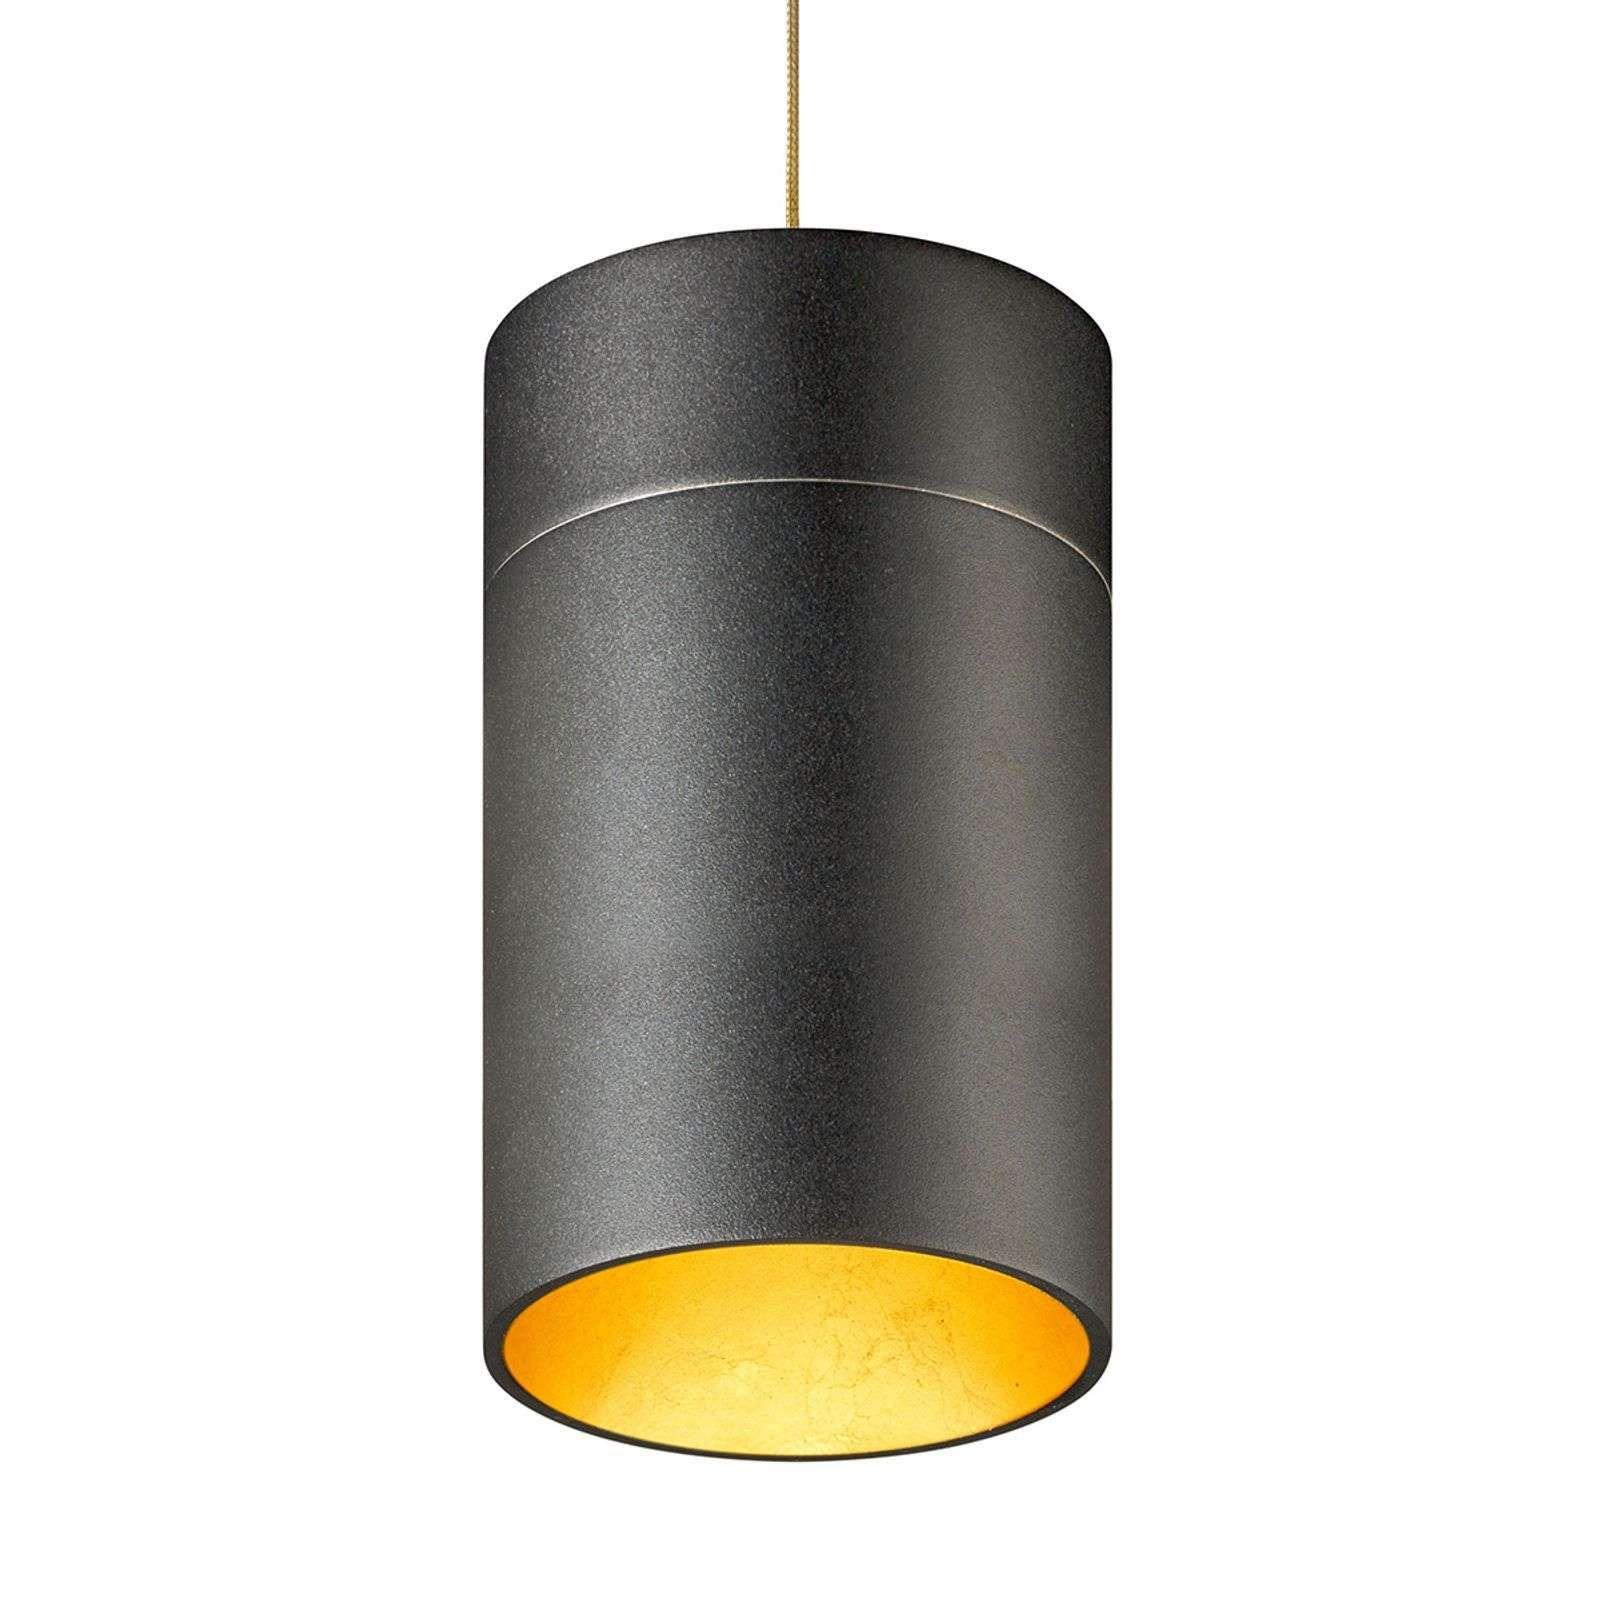 Pendelleuchte Led Höhenverstellbar Dimmbar Pendelleuchten Led Höhenverstellbar Dimmbar Lampen Pendelleuchten Design Pend Luminaire Lamp Intérieur Moderne